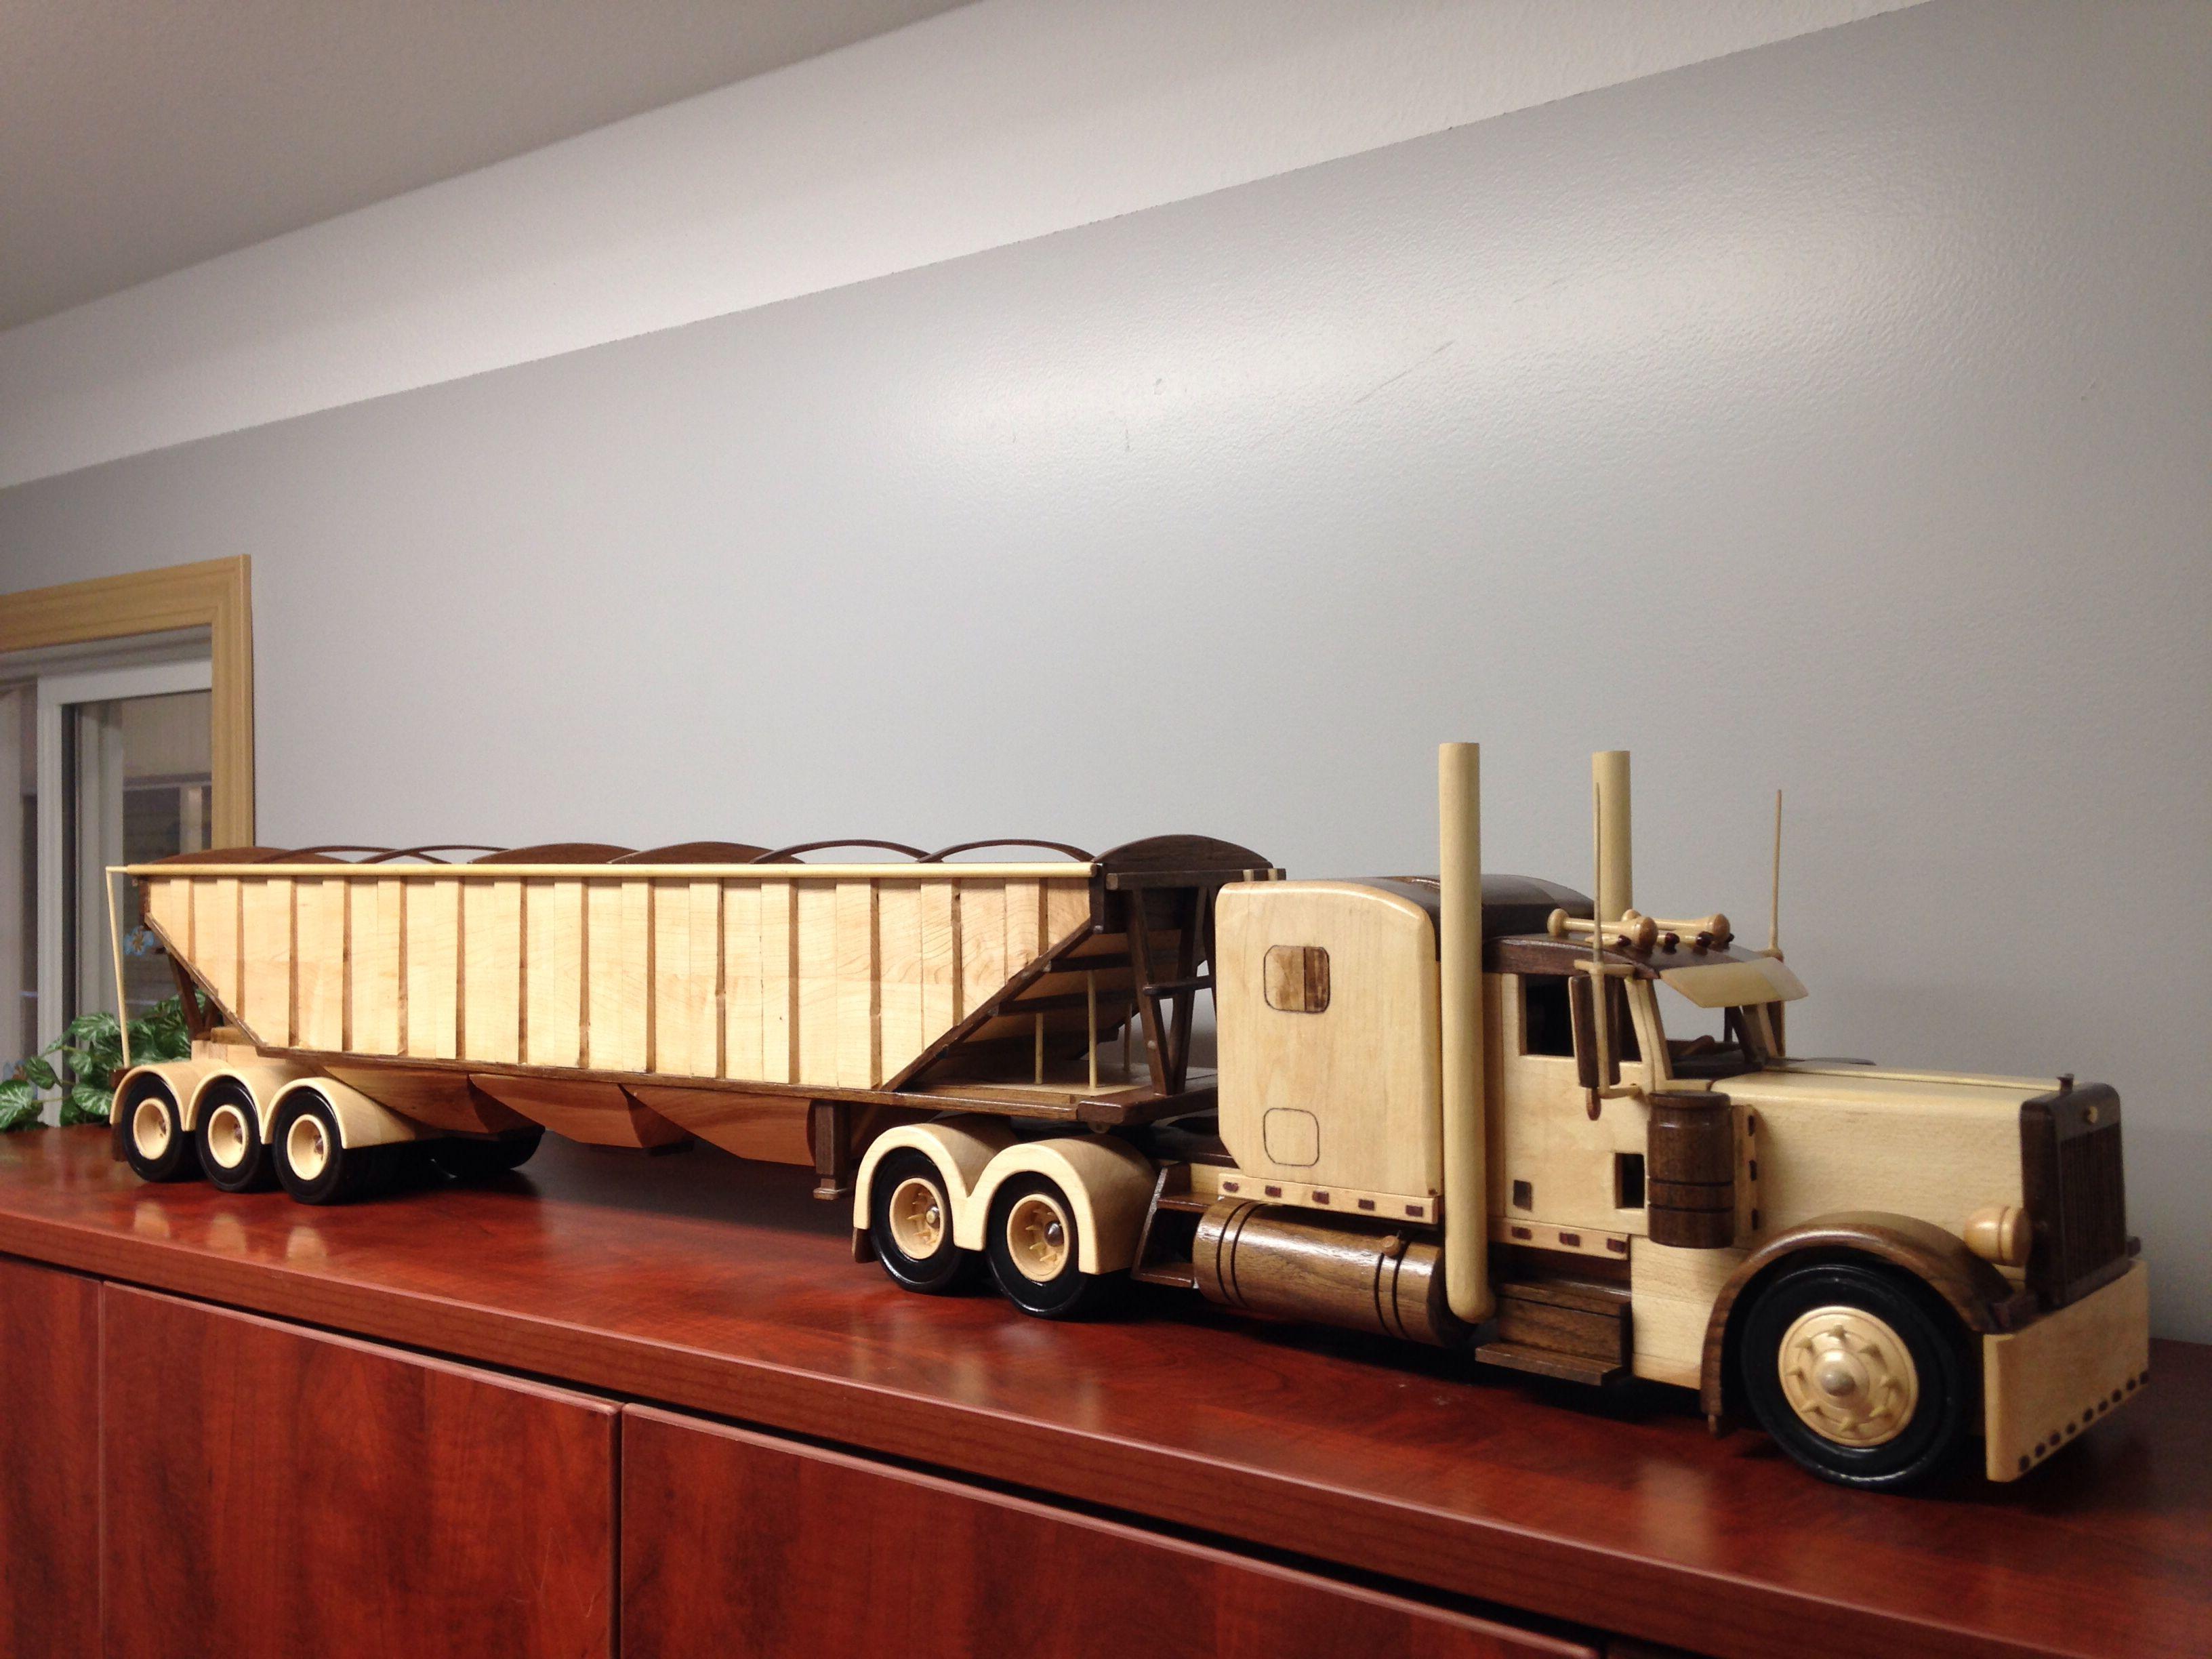 Wooden peterbilt truck wooden toys pinterest for Wood floor for 379 peterbilt